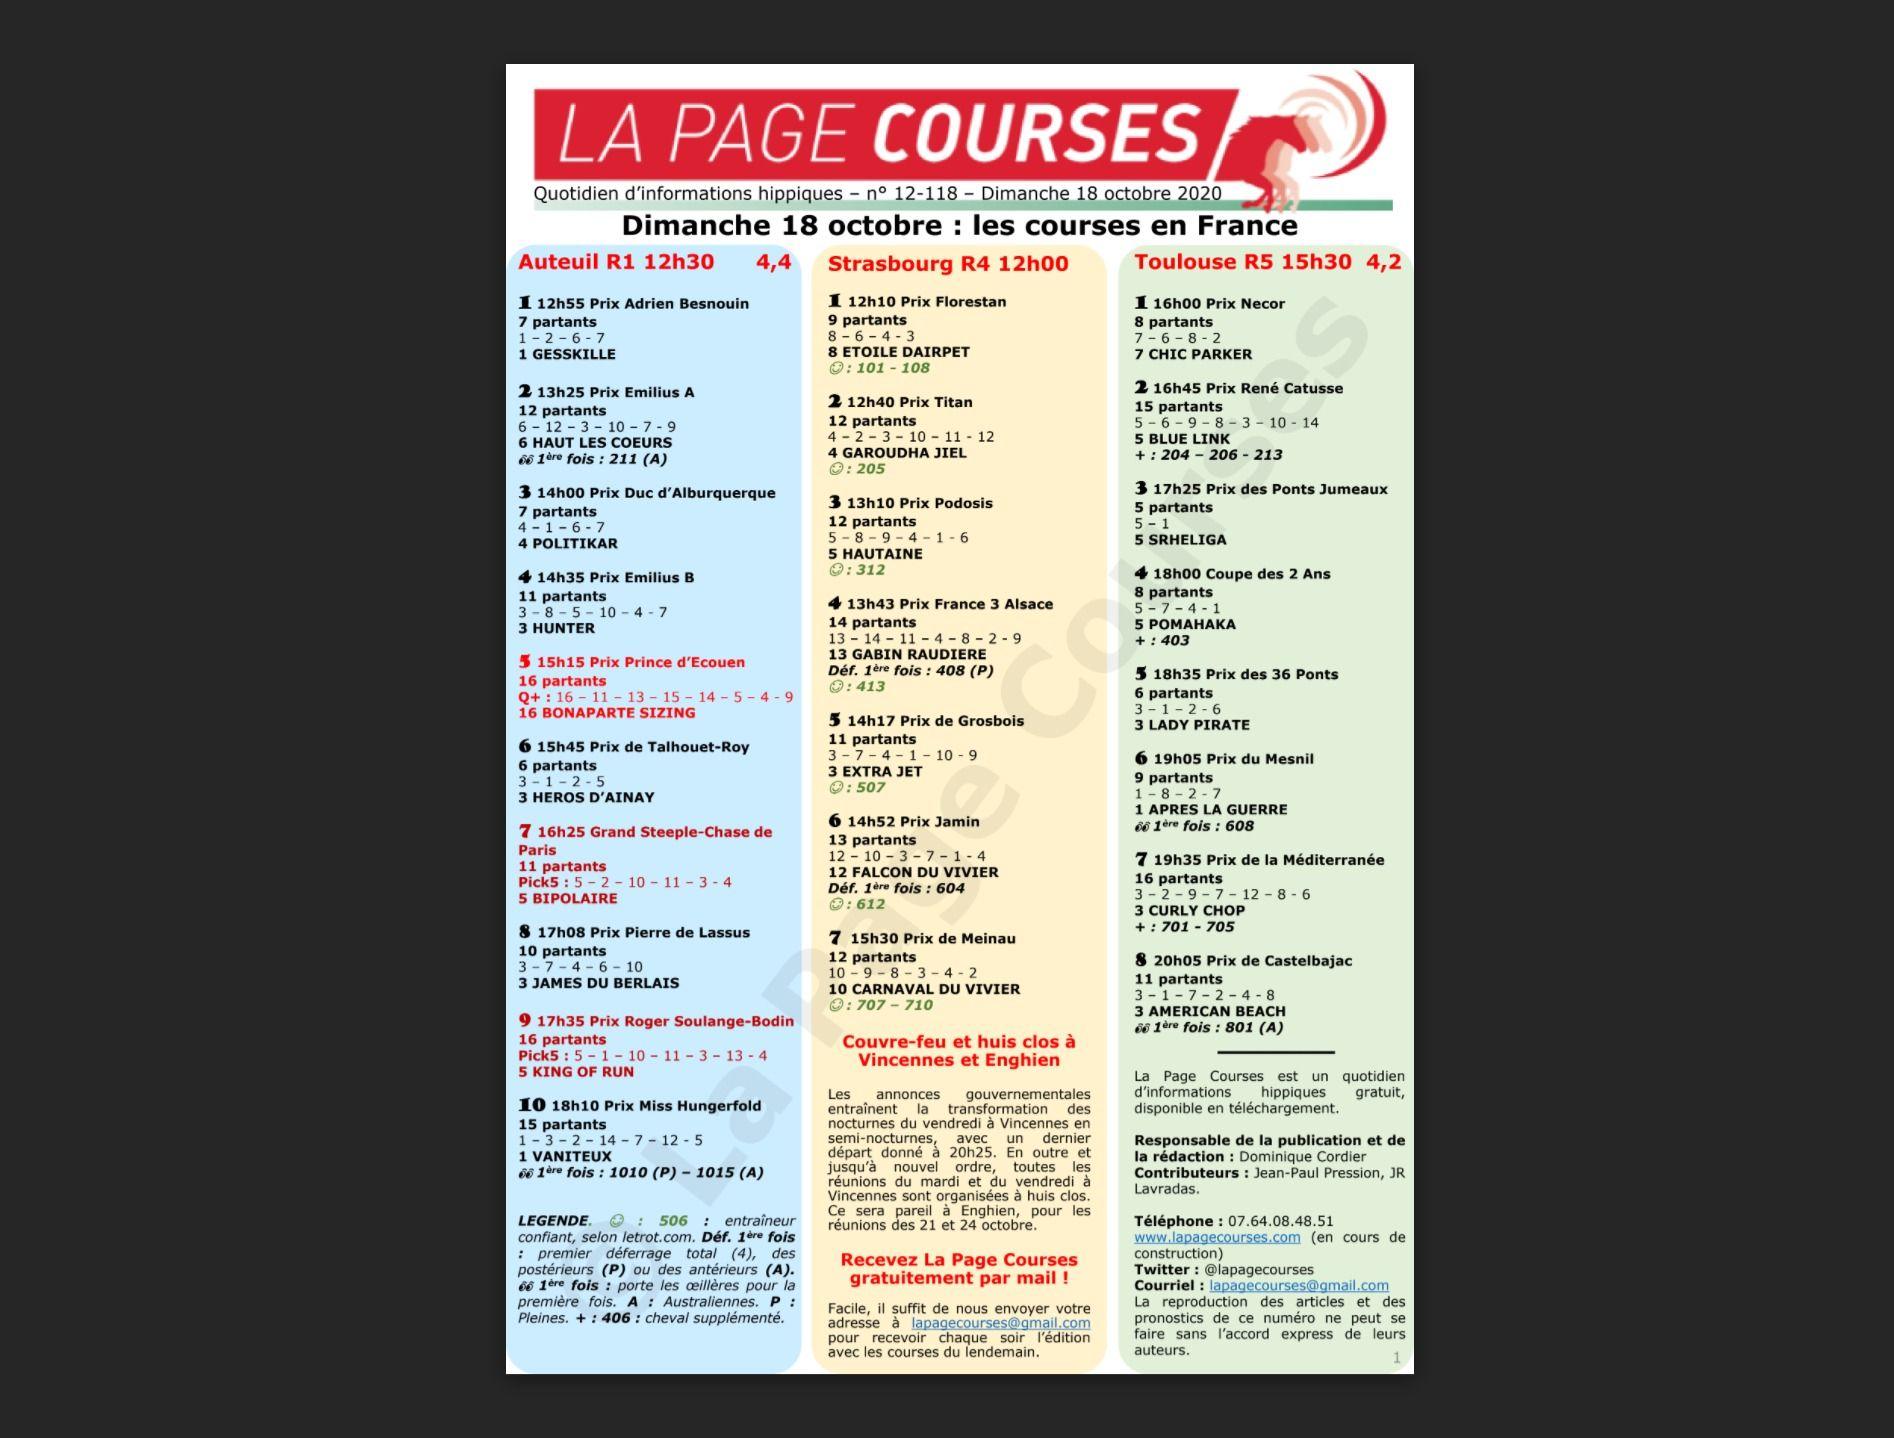 FireShotCapture156-Lapagecourses12-118.pdf-GoogleDrive-drive.google.com.jpg